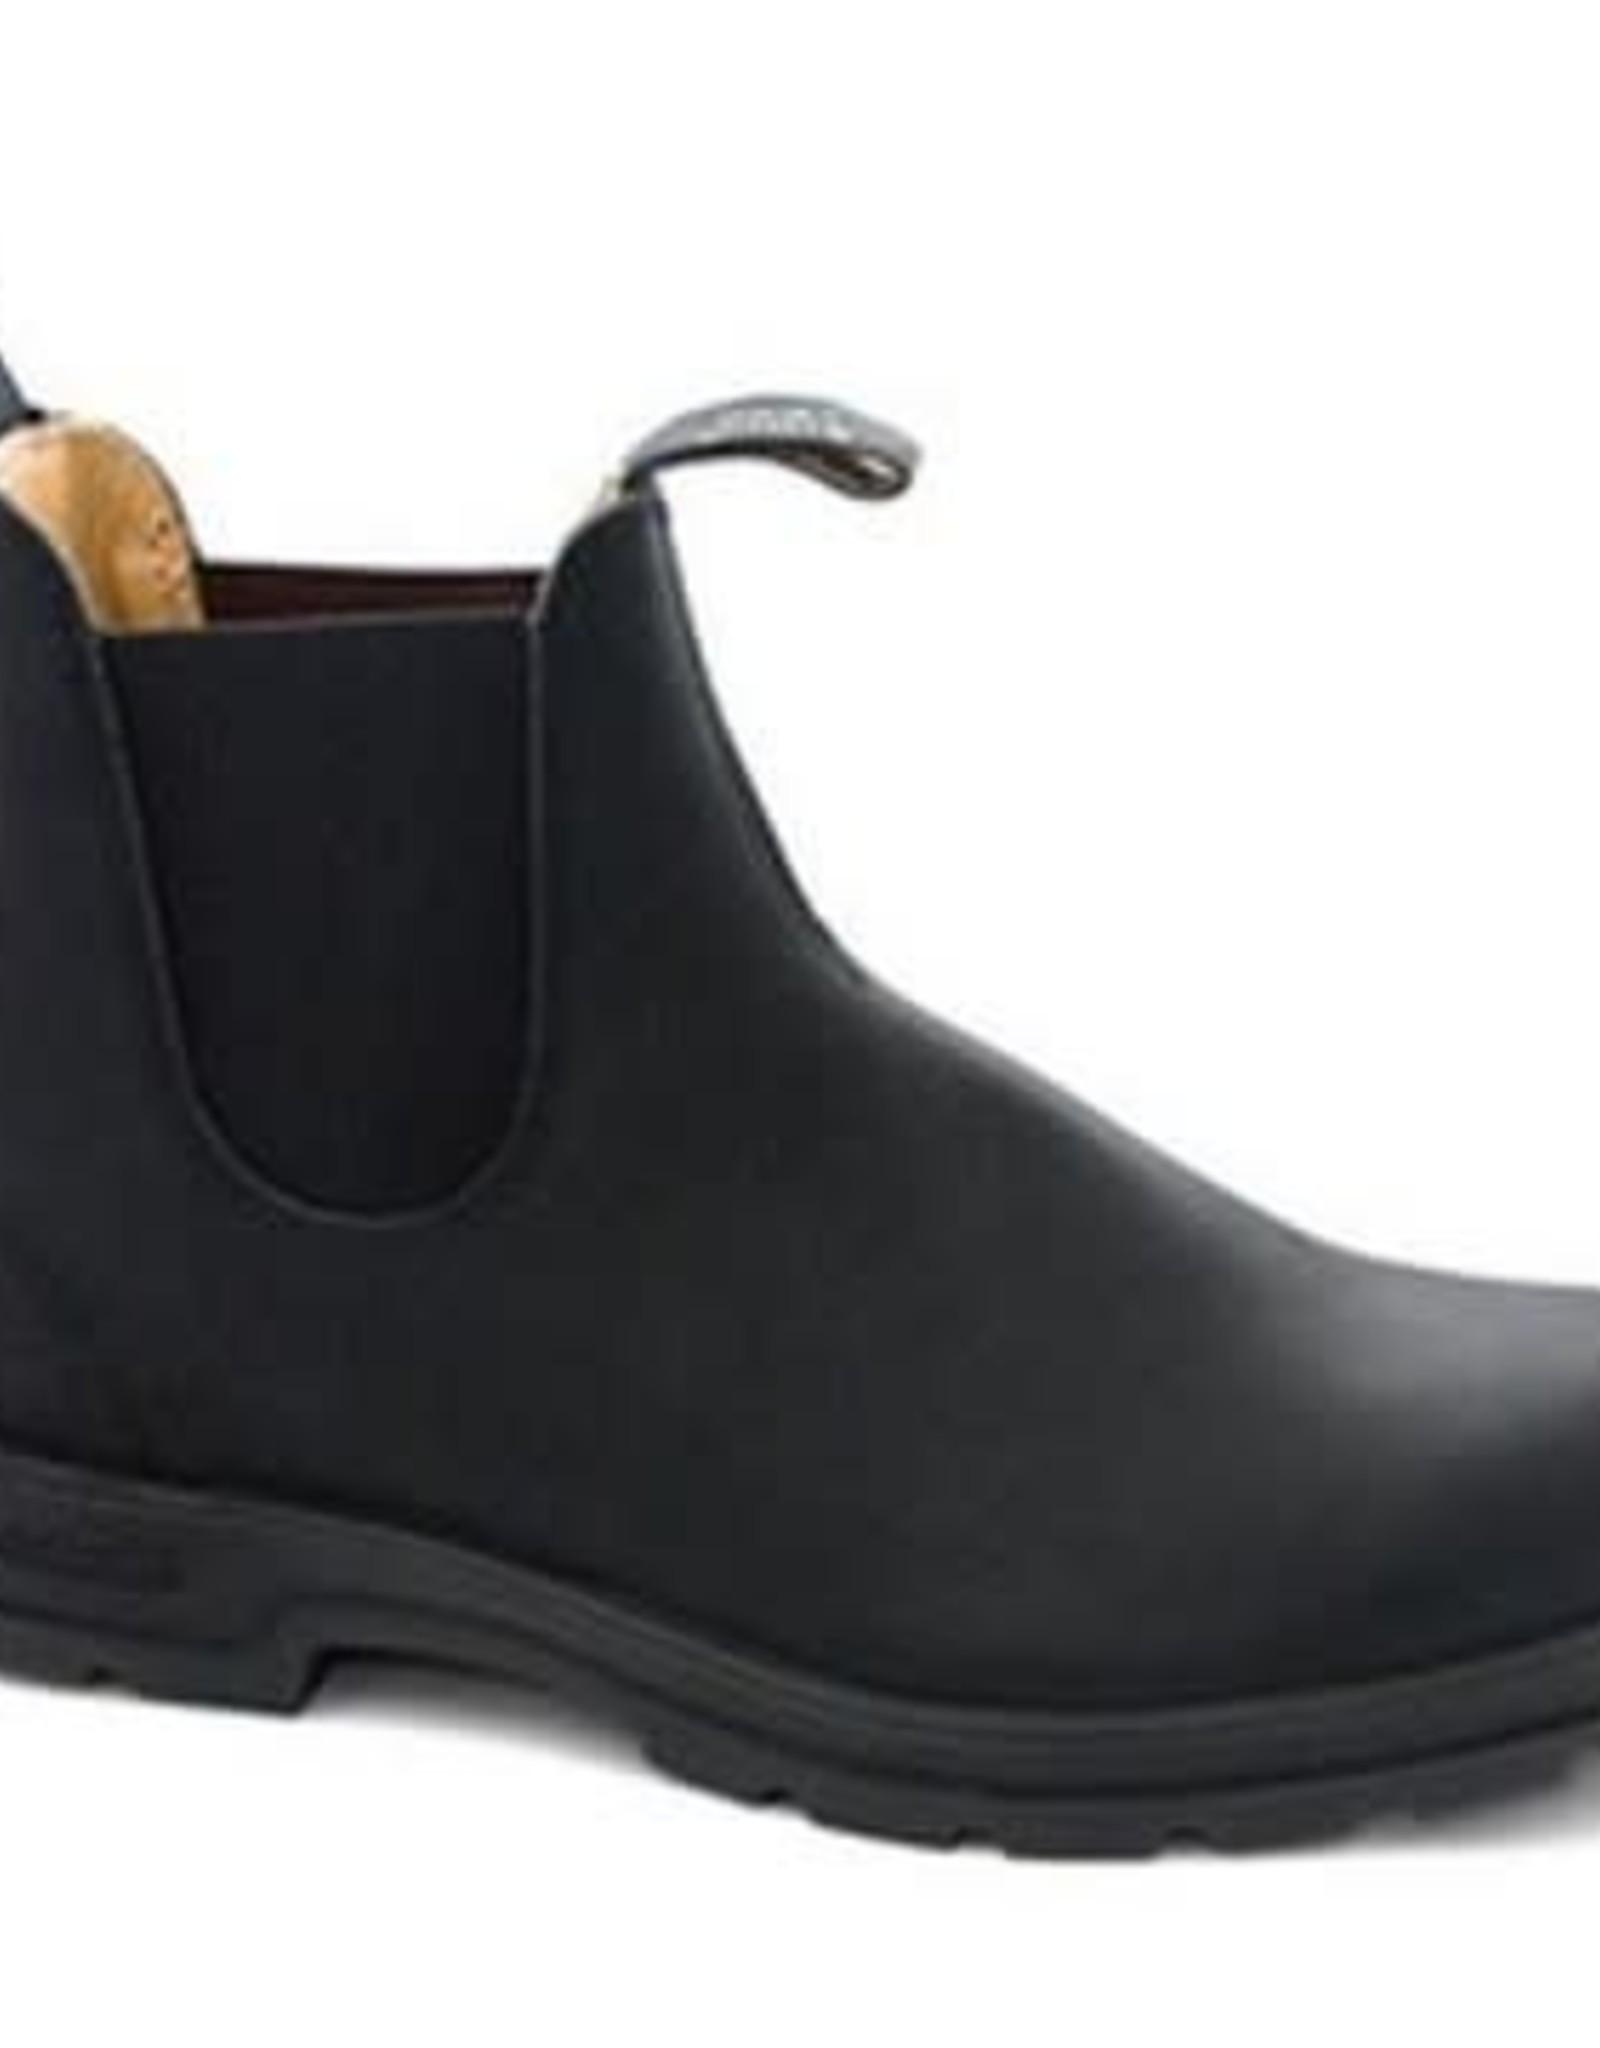 Blundstone Blundstone, 558 Leather Lined Black , 1WIDTH, 9.5